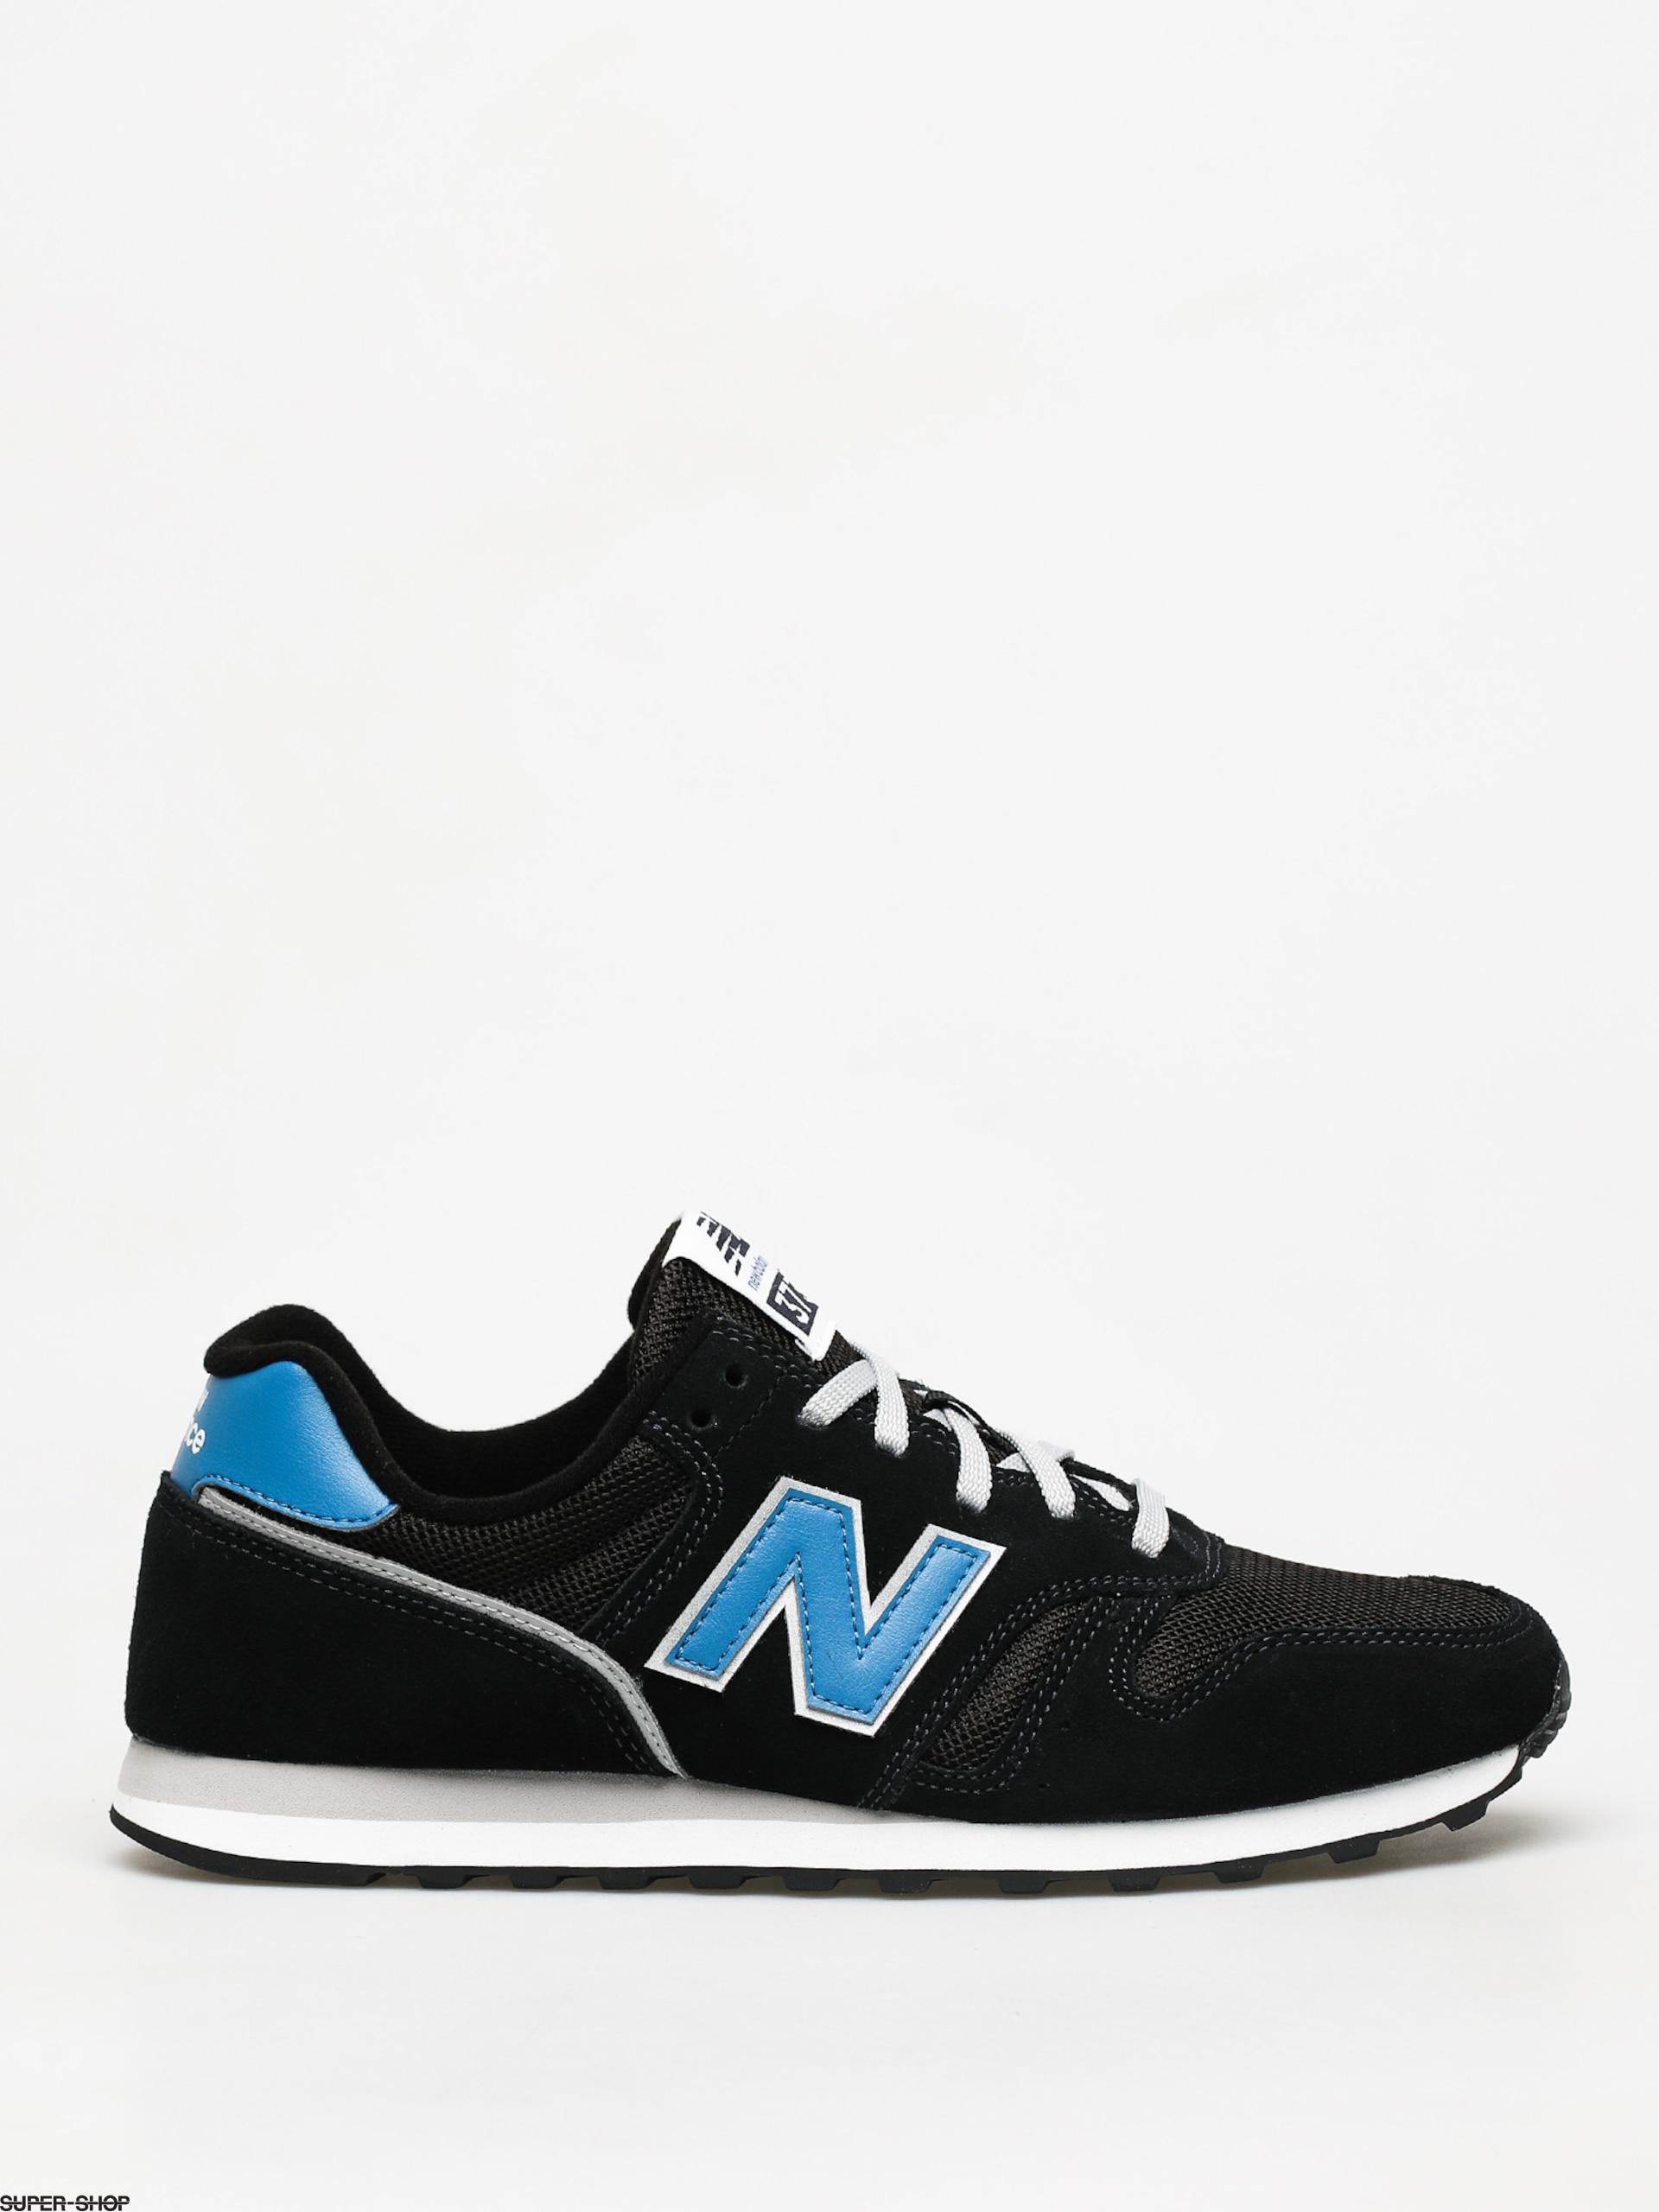 New Balance 373 Shoes (black/blue)